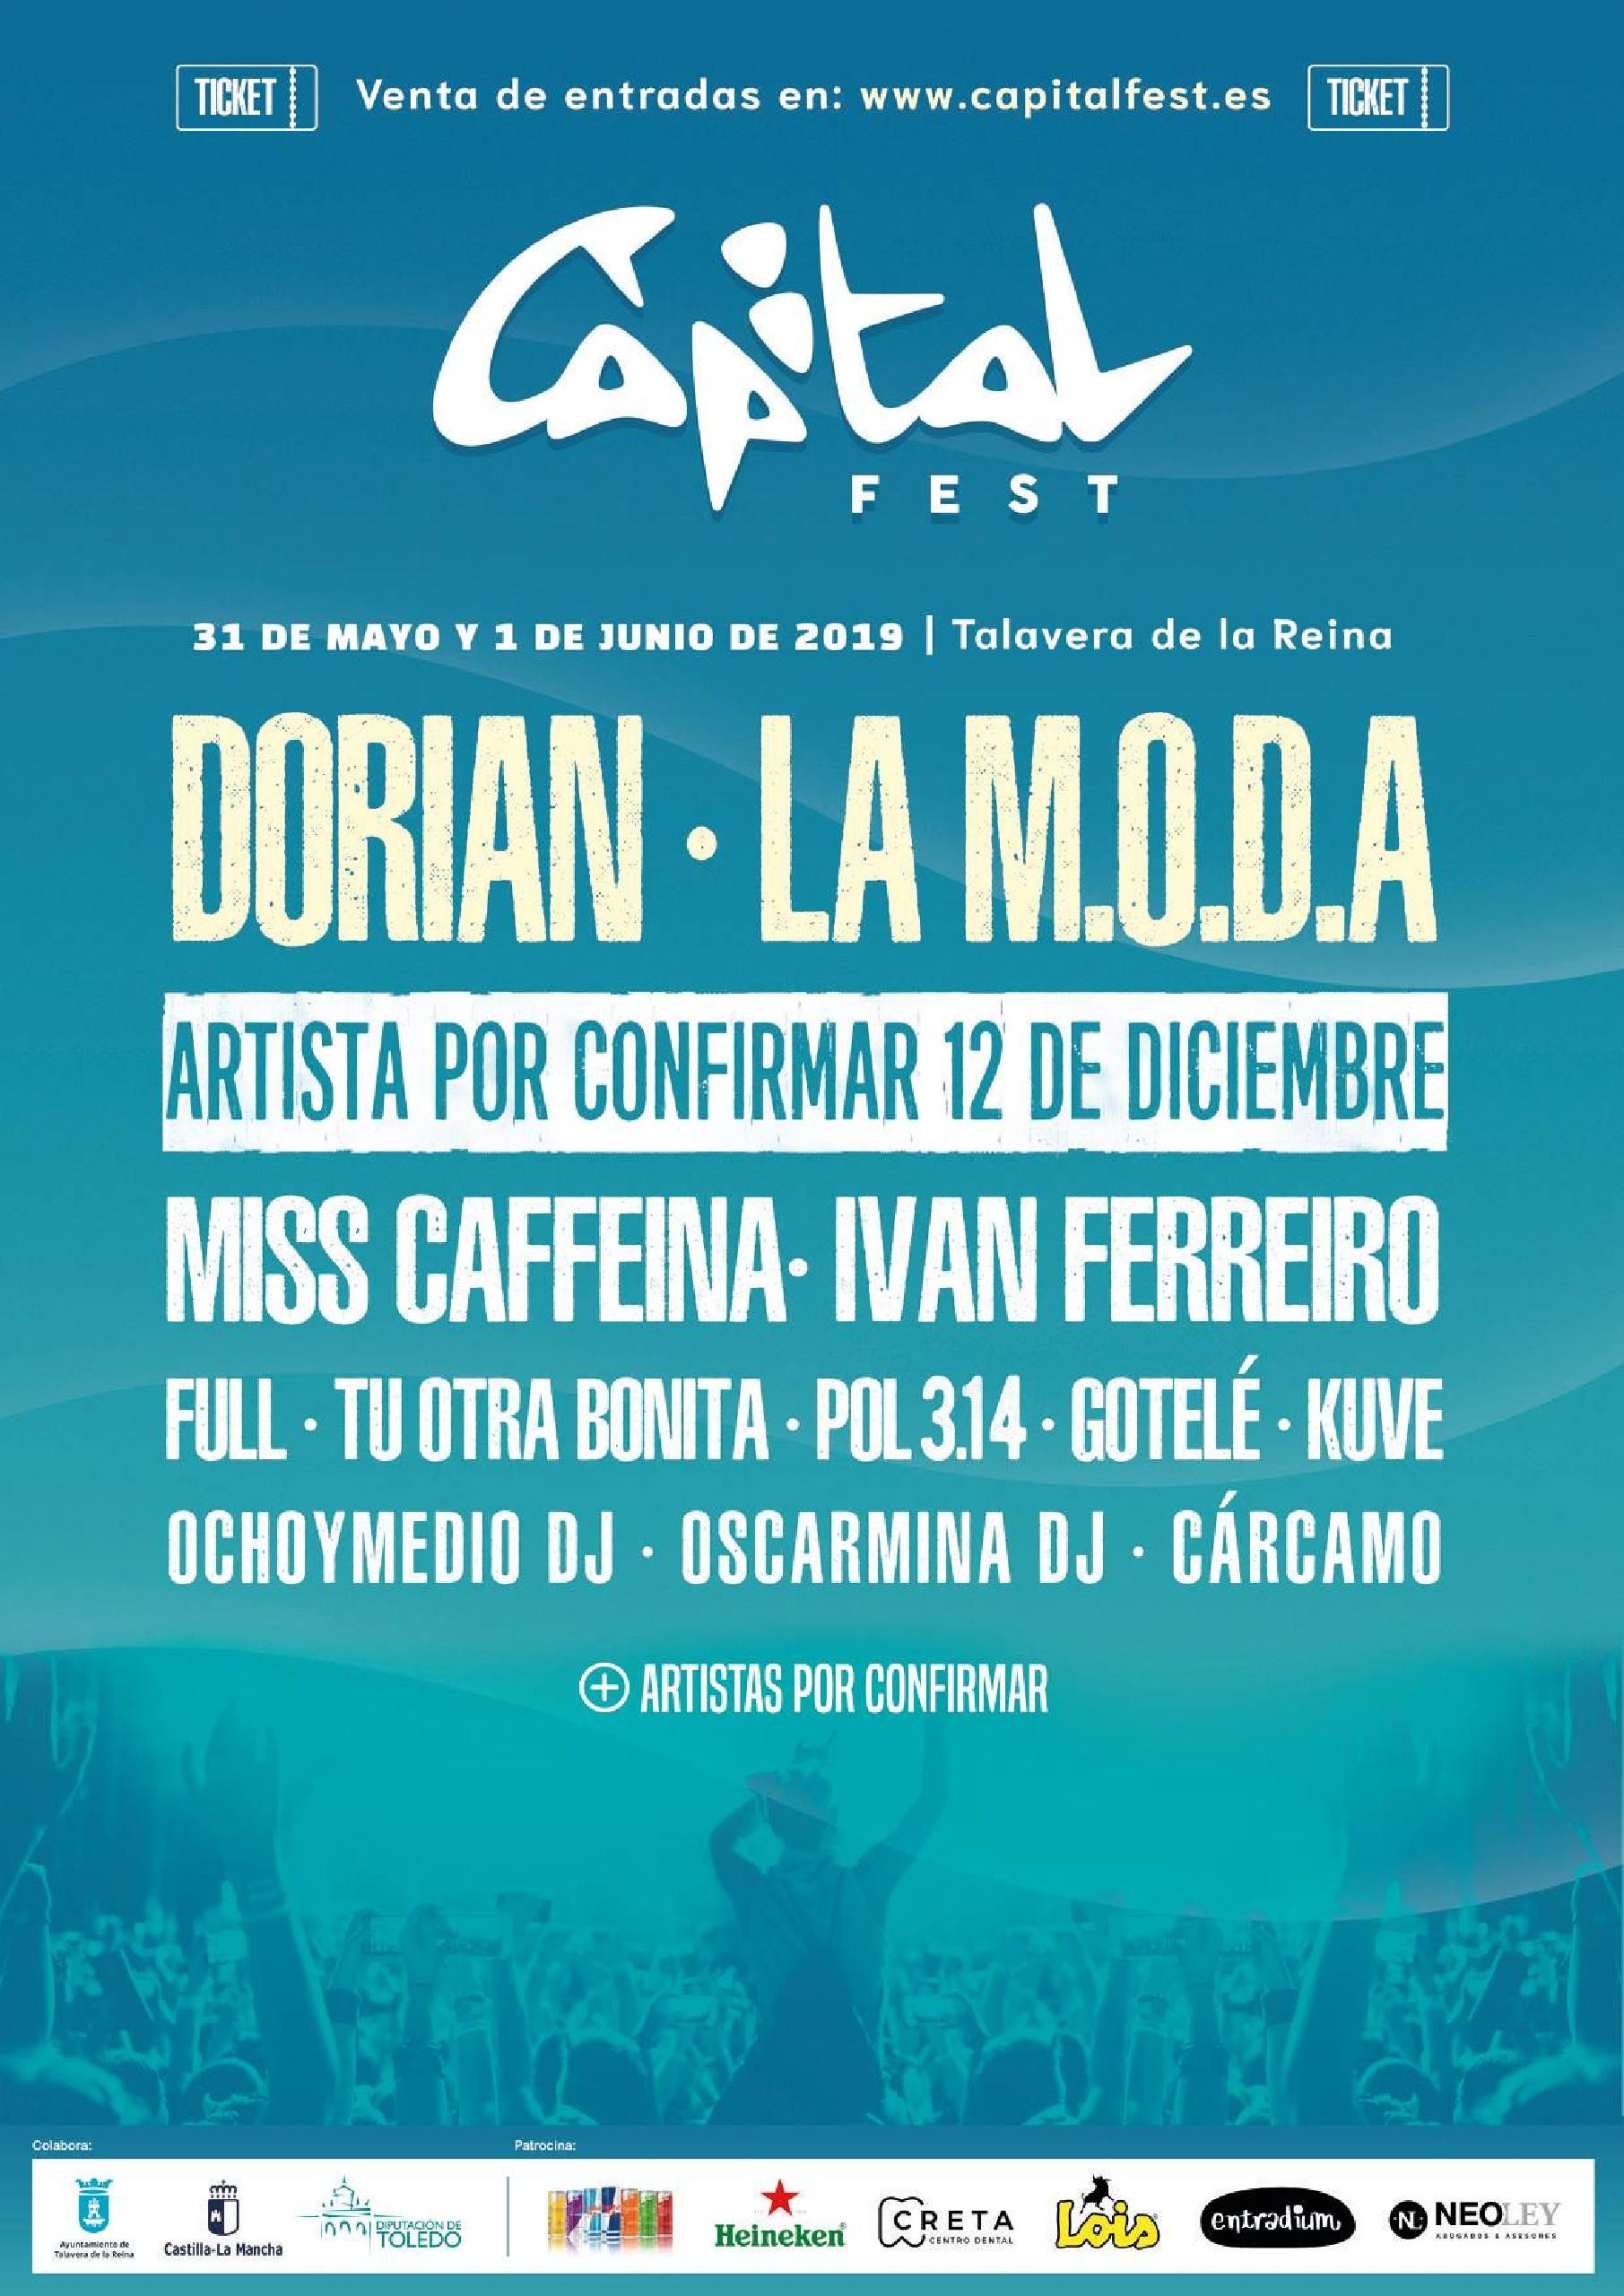 Cartel Capital Fest 2019